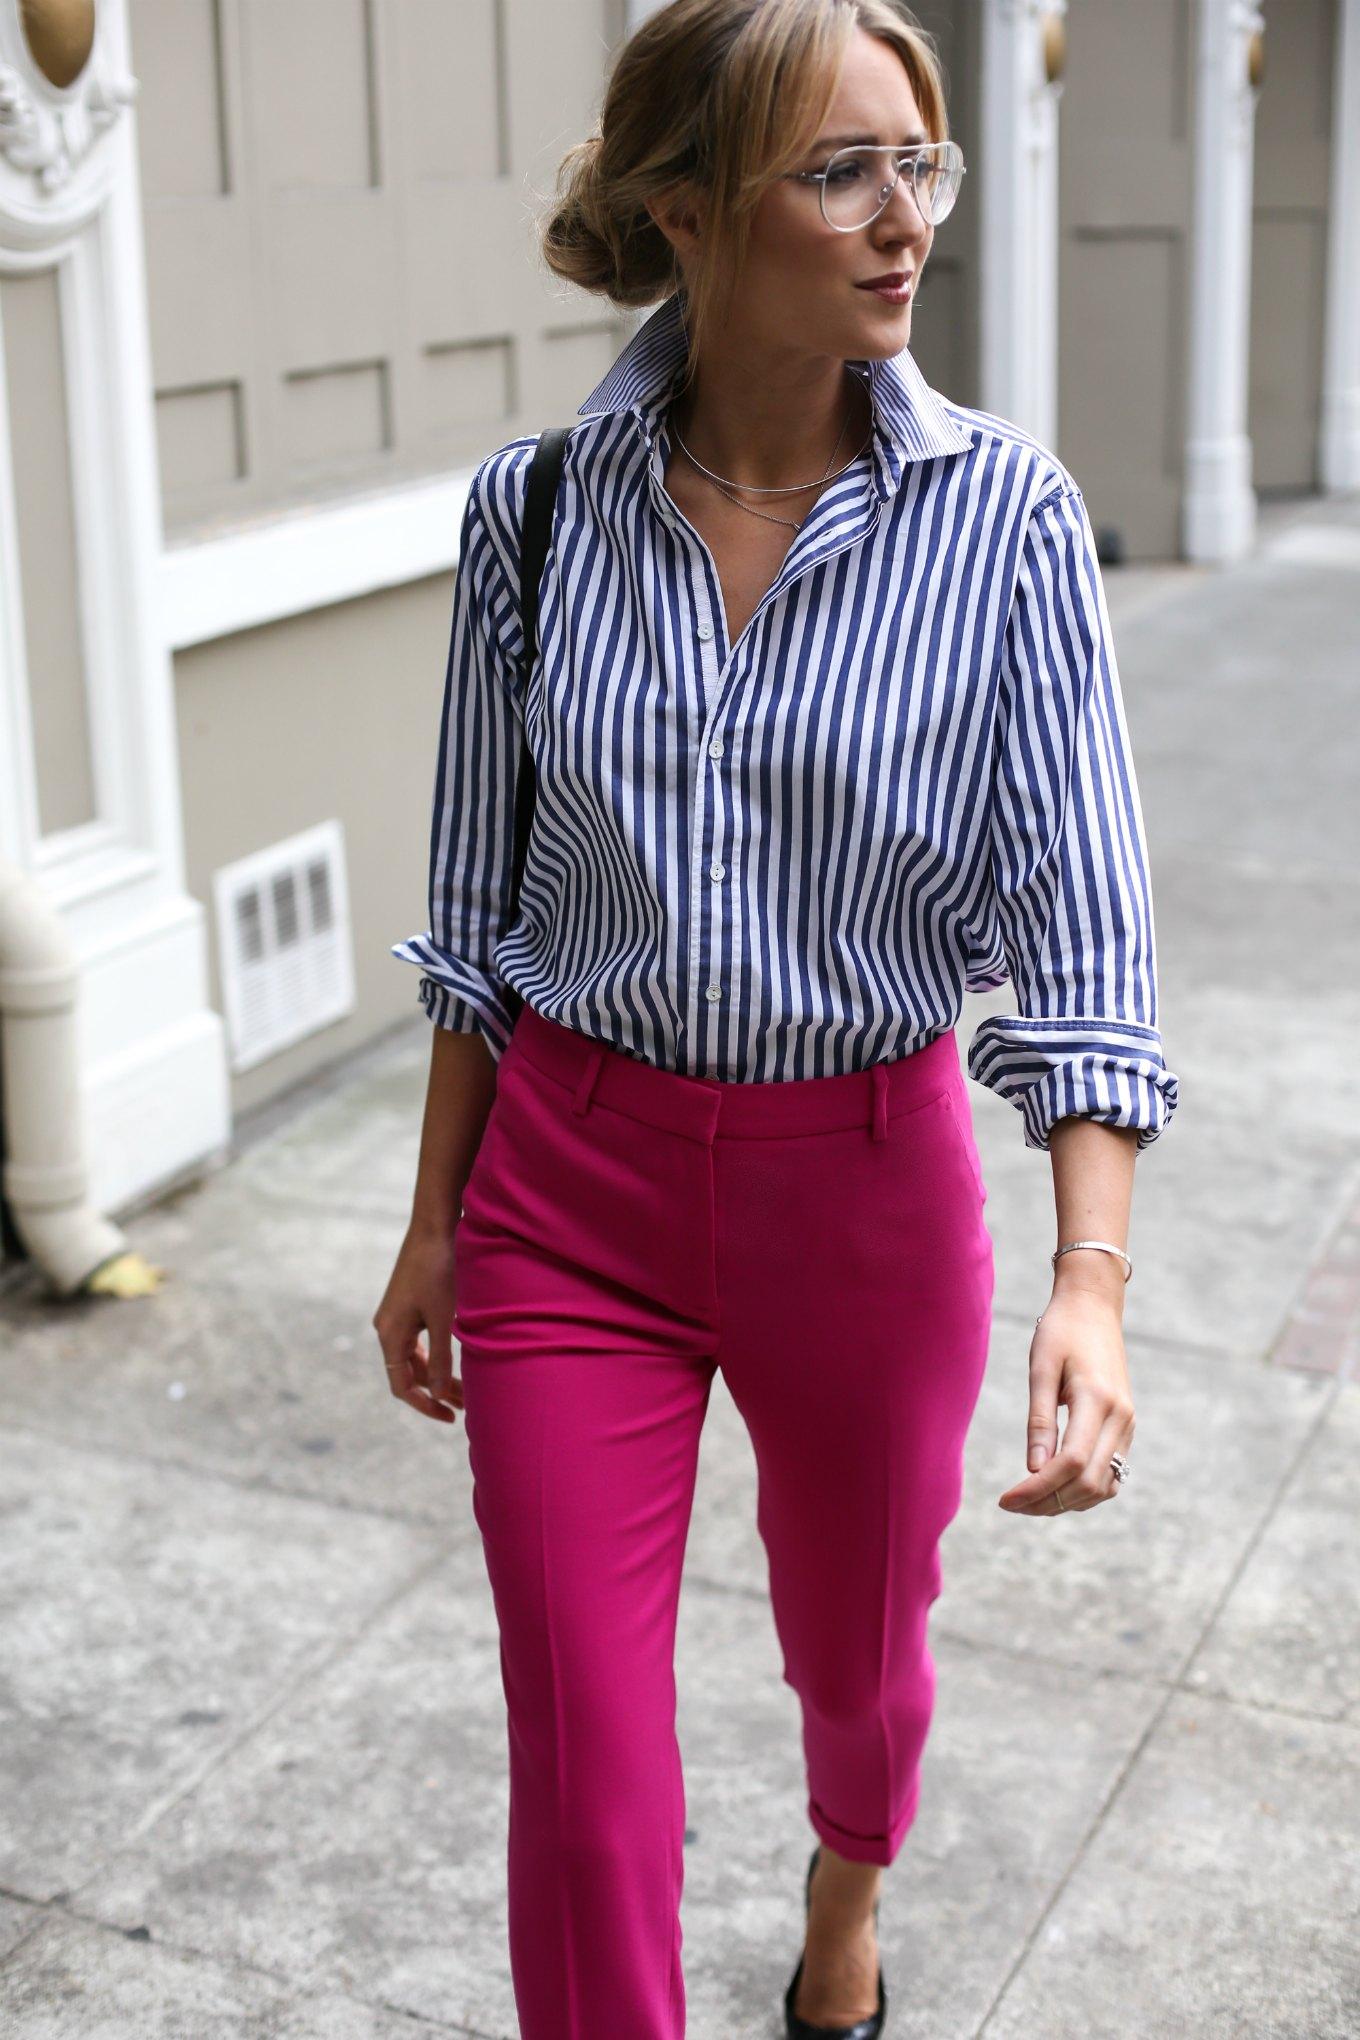 nordstrom-j-crew-fuchsia-pink-cuffed-cropped-pant-rag-and-bone-striped-boyfriend-shirt-workwear-fashion-style-blog4